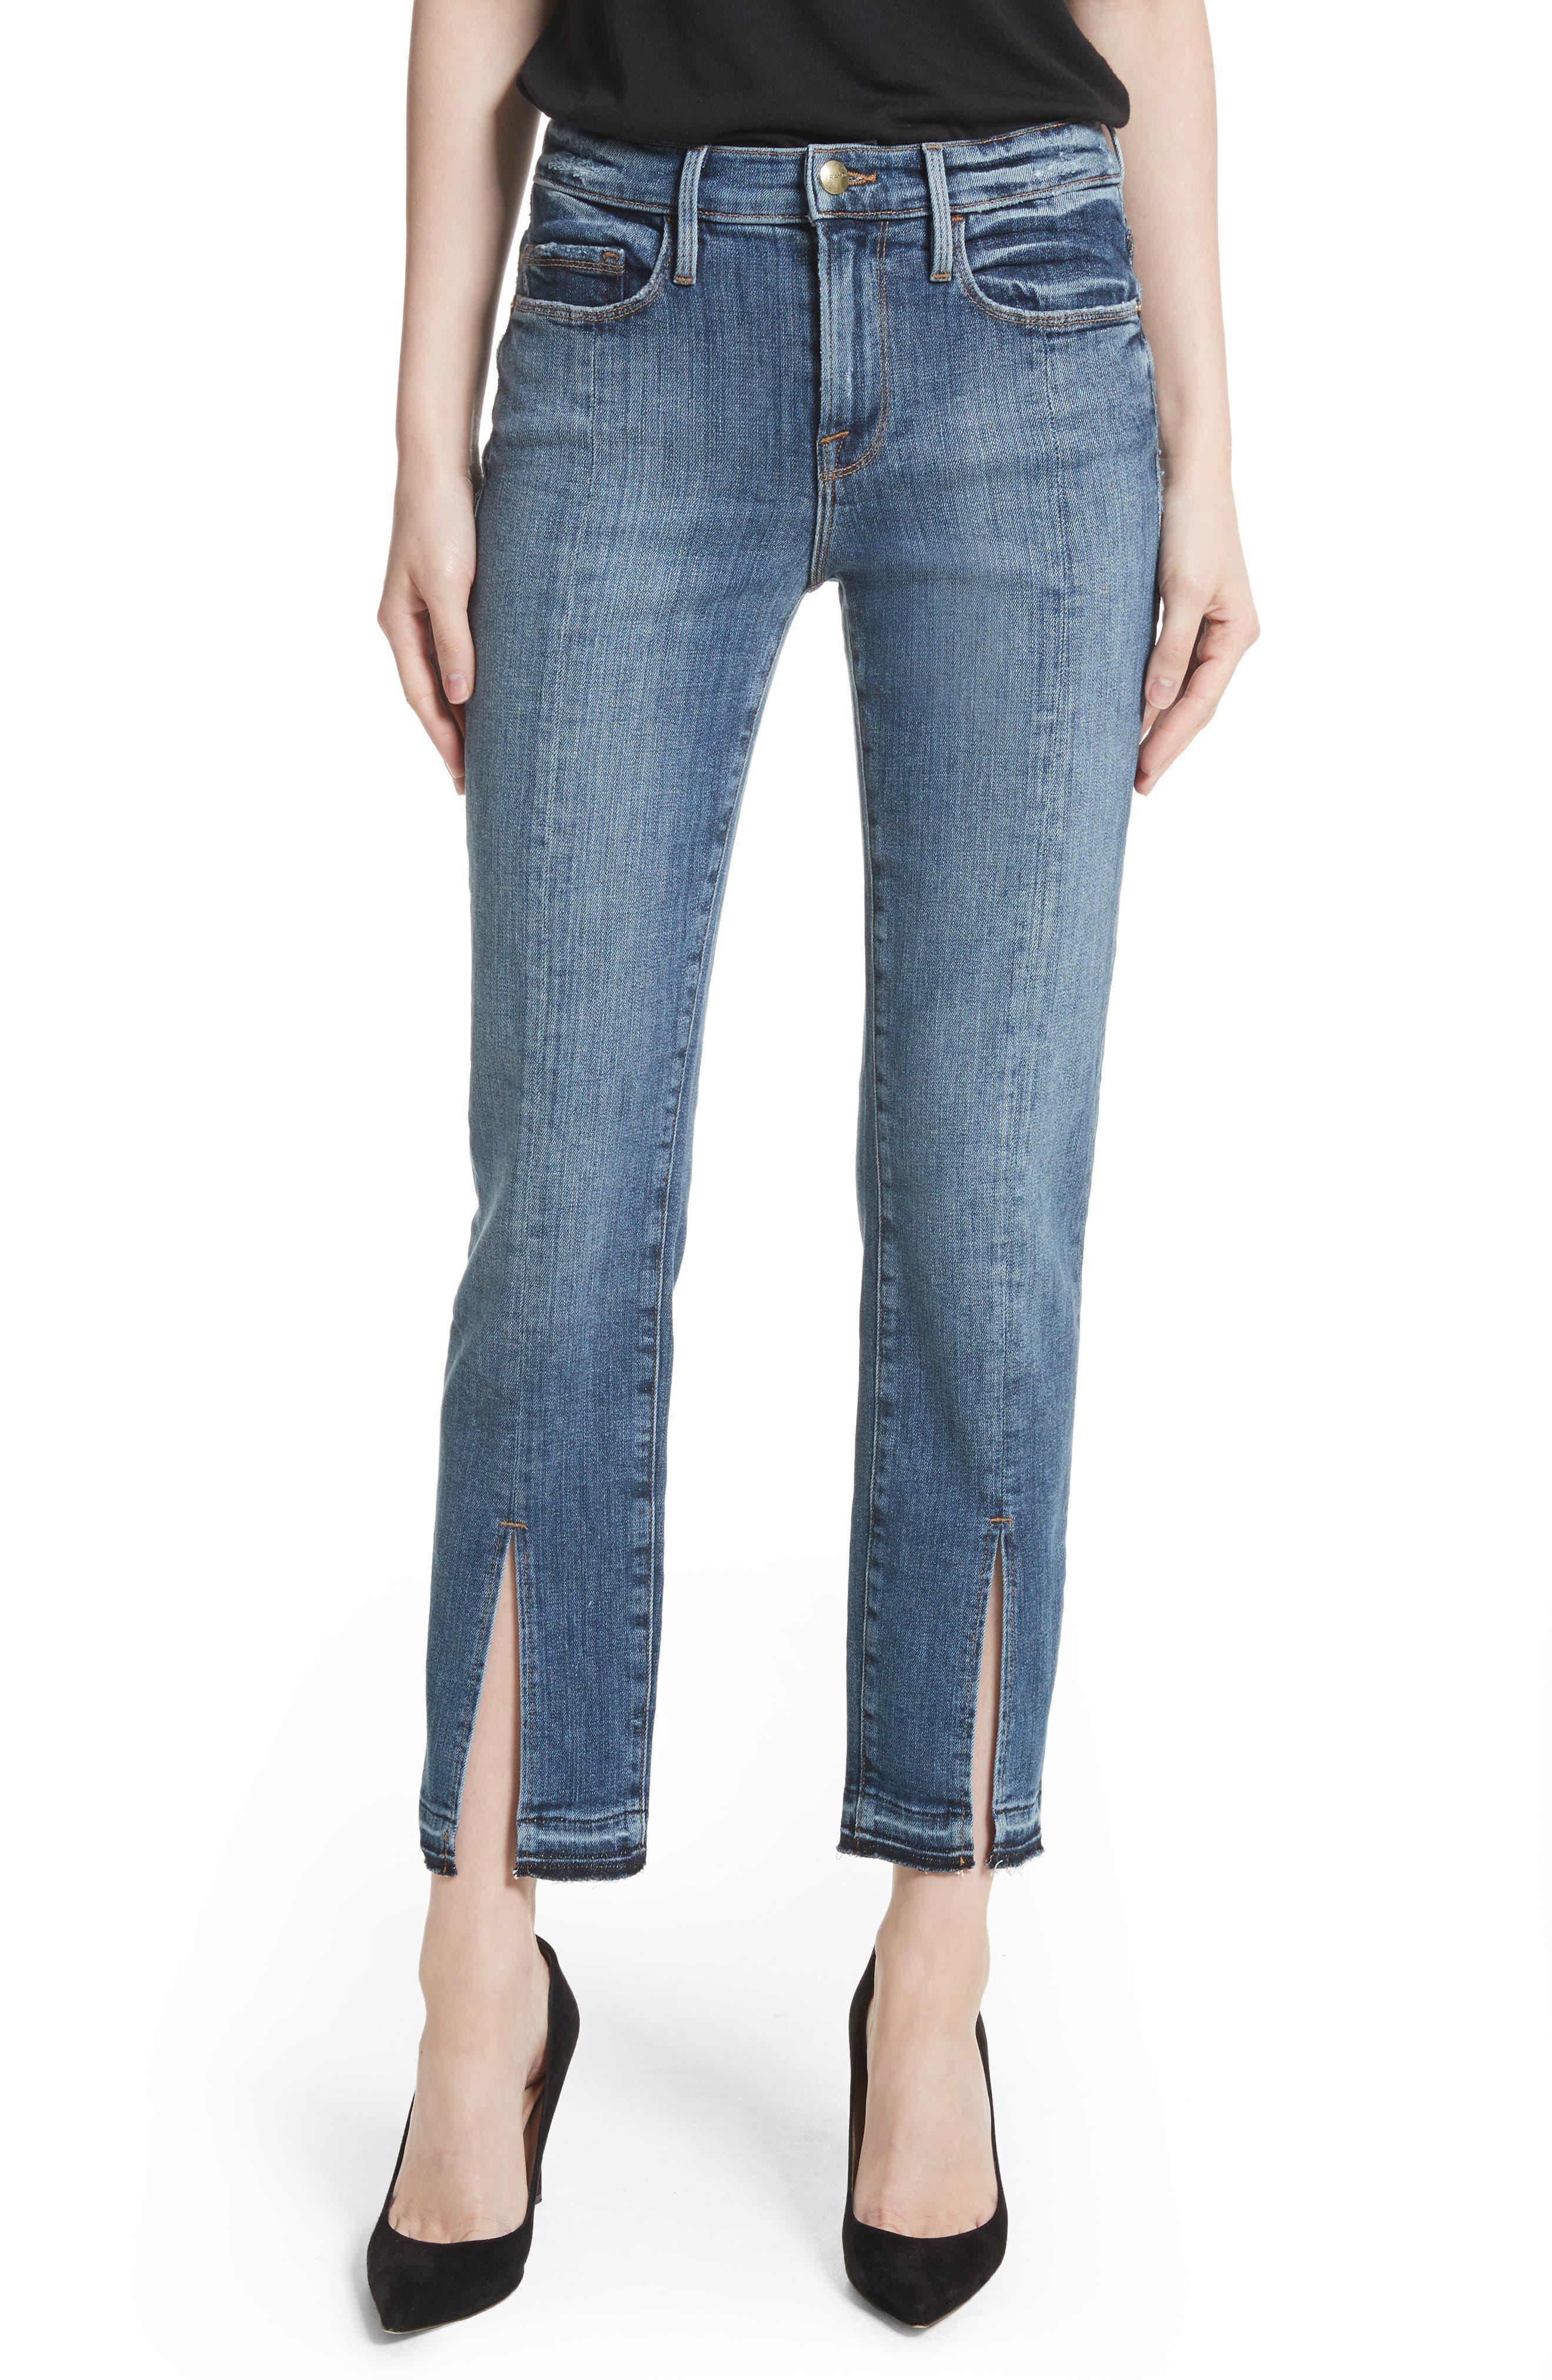 Alternate Image 1 Selected - FRAME Le Nouveau Split Hem Jeans (Sheffield) (Nordstrom Exclusive)